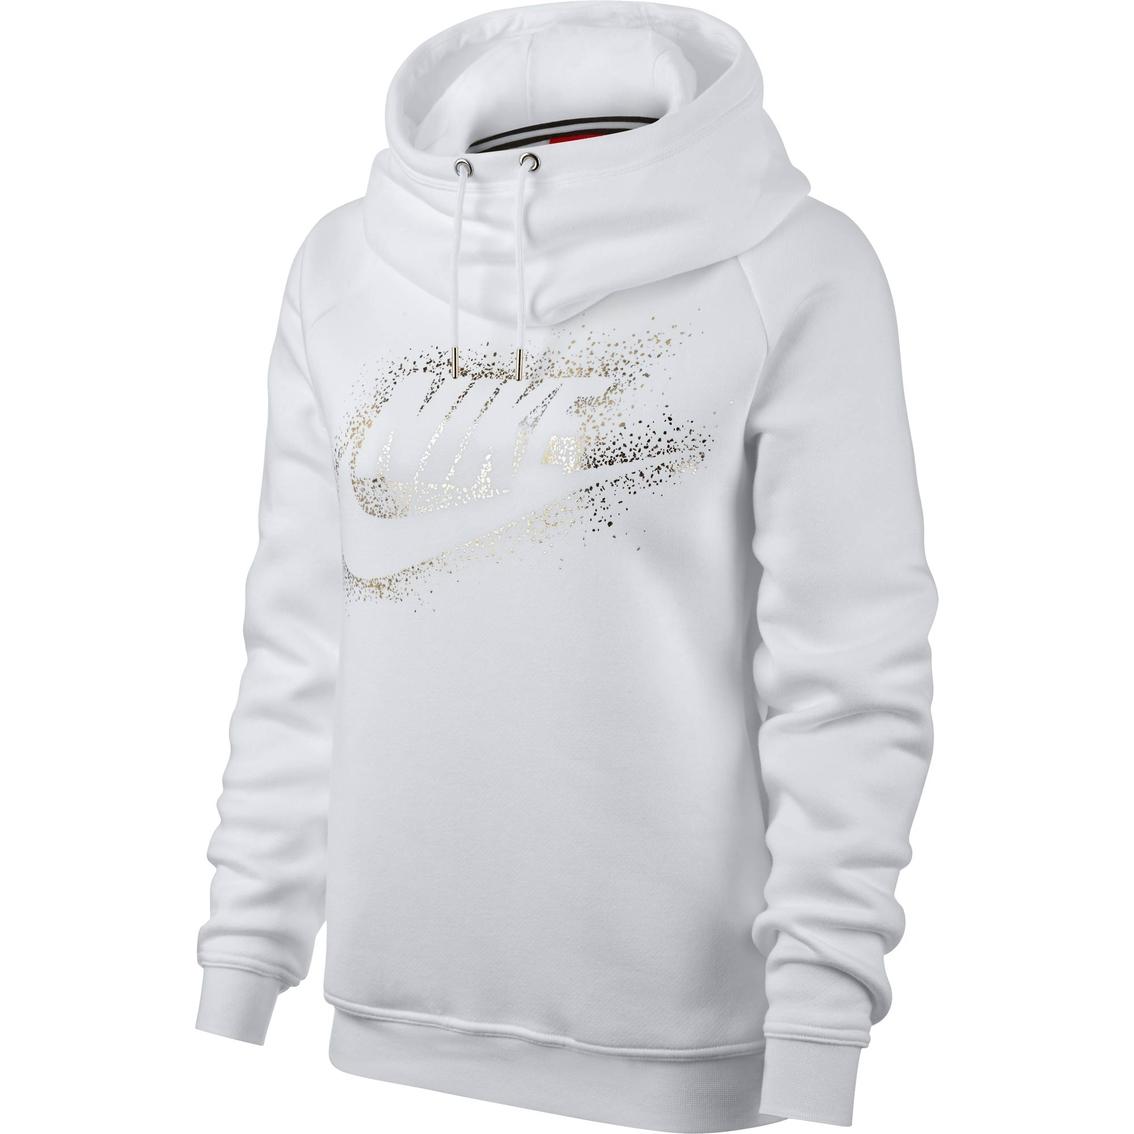 60949fd56 Nike Sportswear Rally Funnel Neck Hoodie | Hoodies & Sweatshirts ...